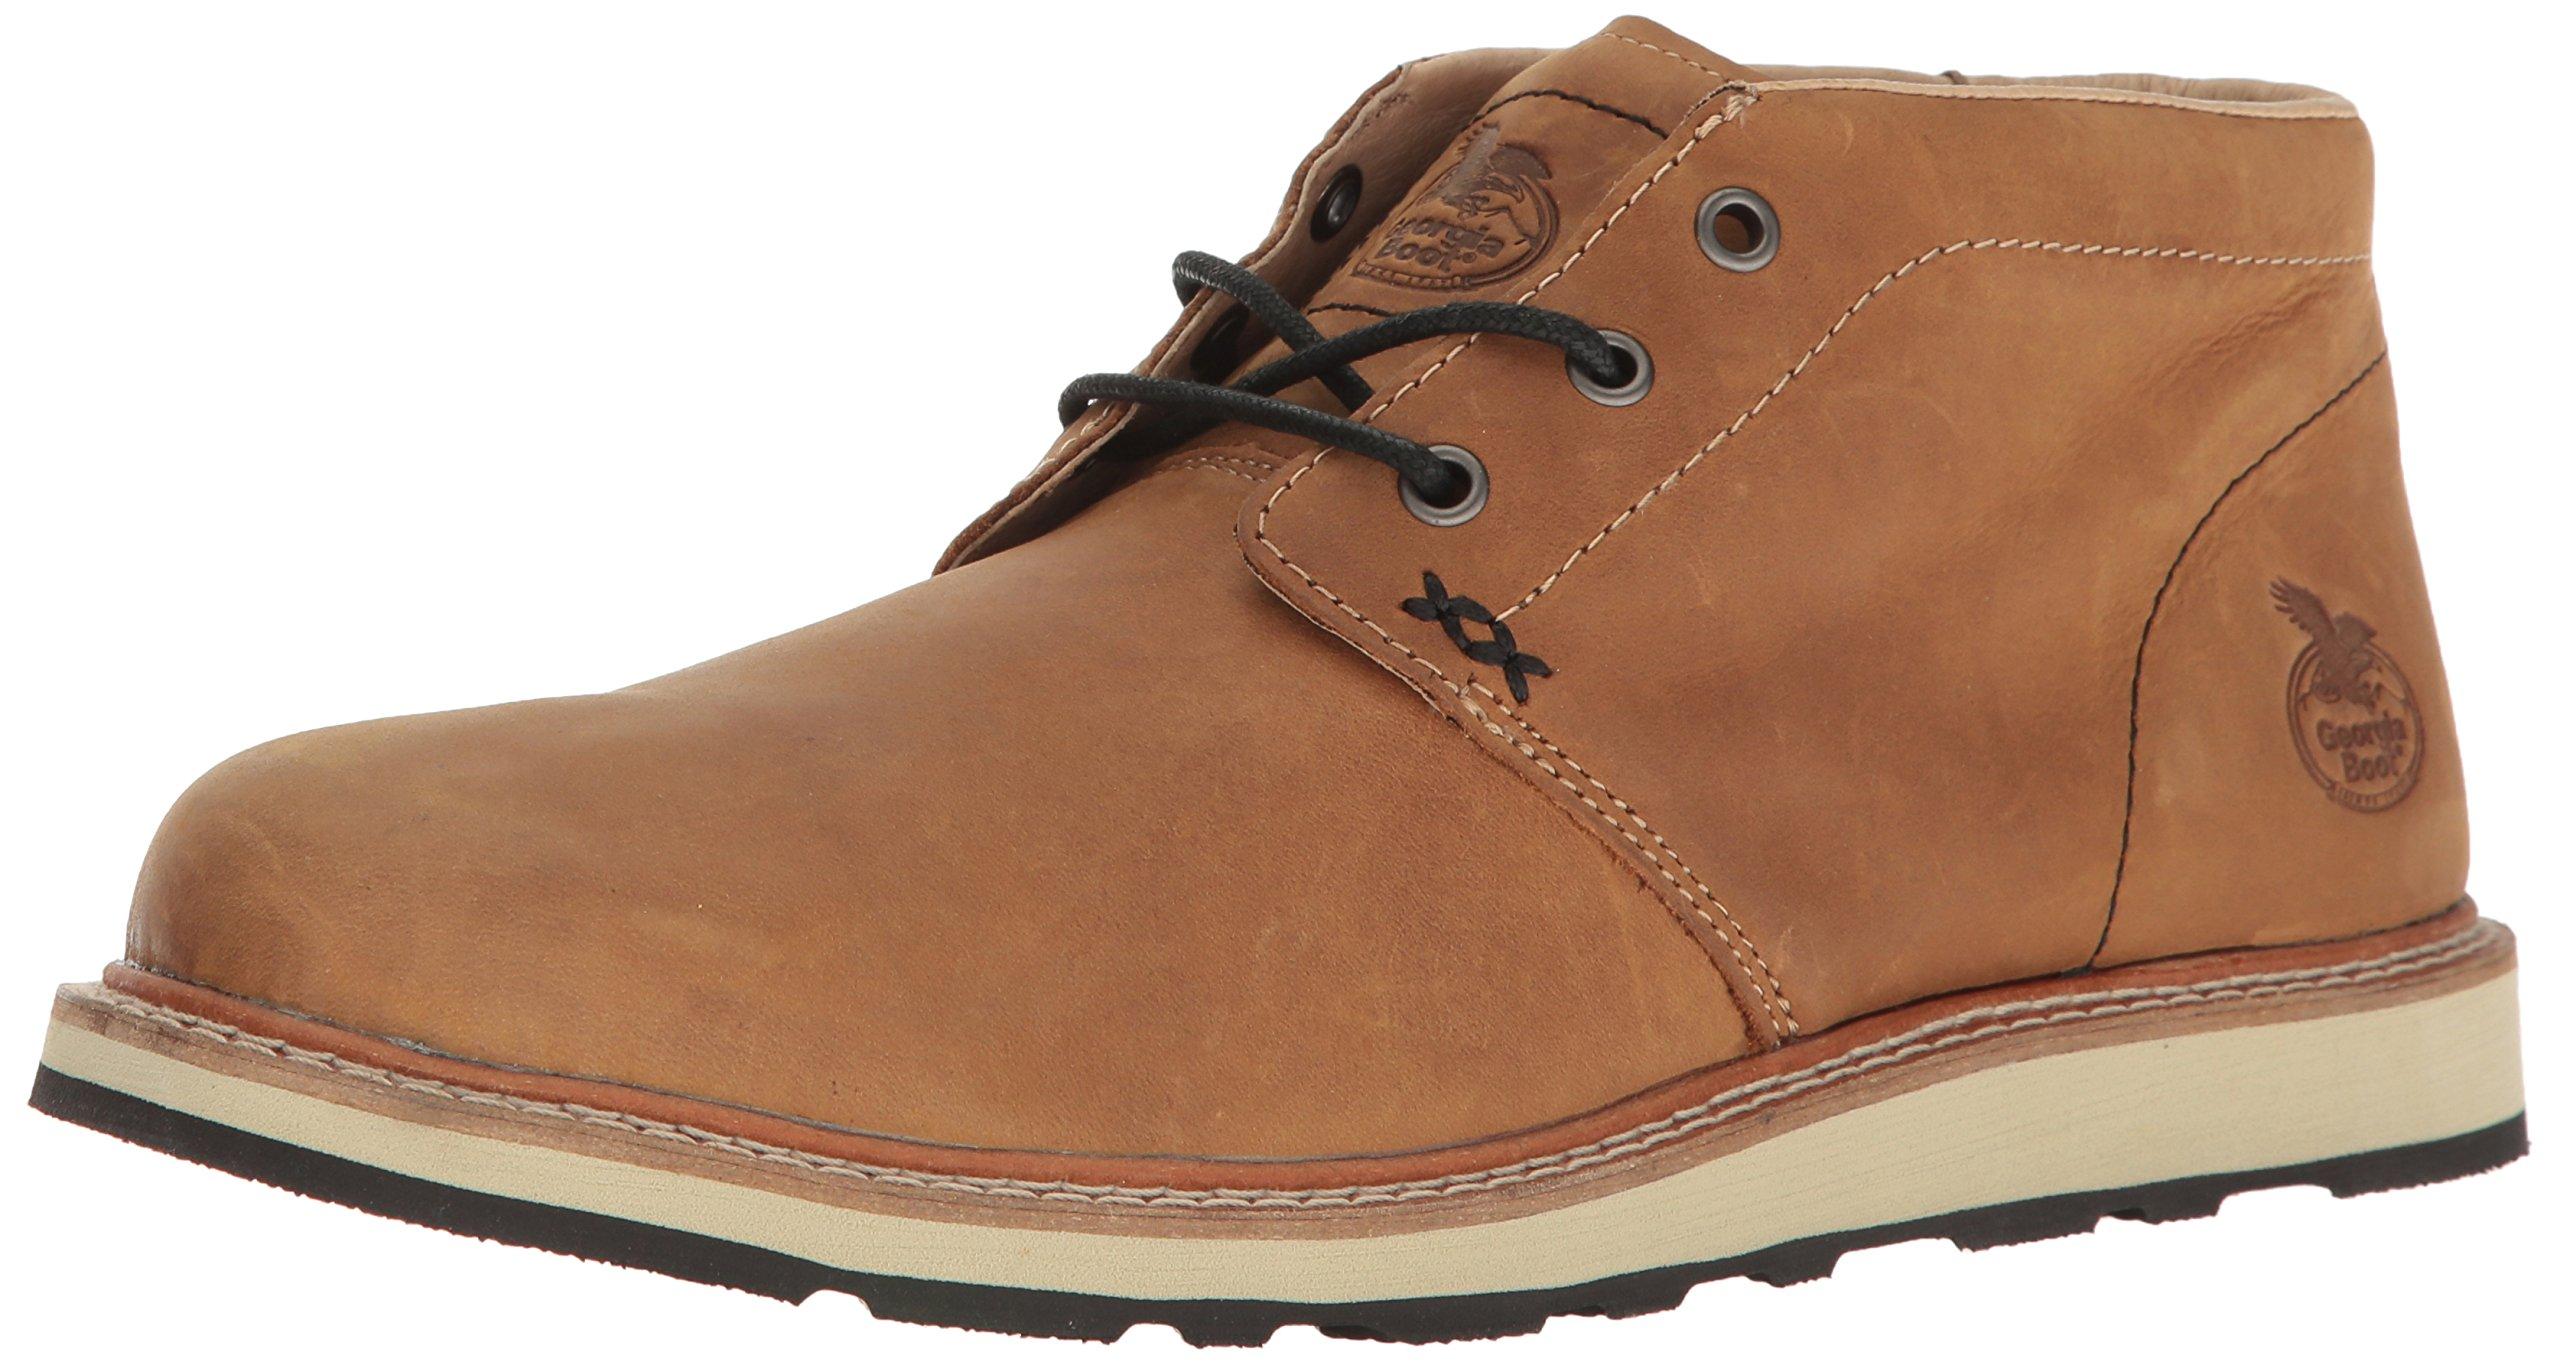 Georgia GB00176 Loafer, Saddle Tan, 9 W US